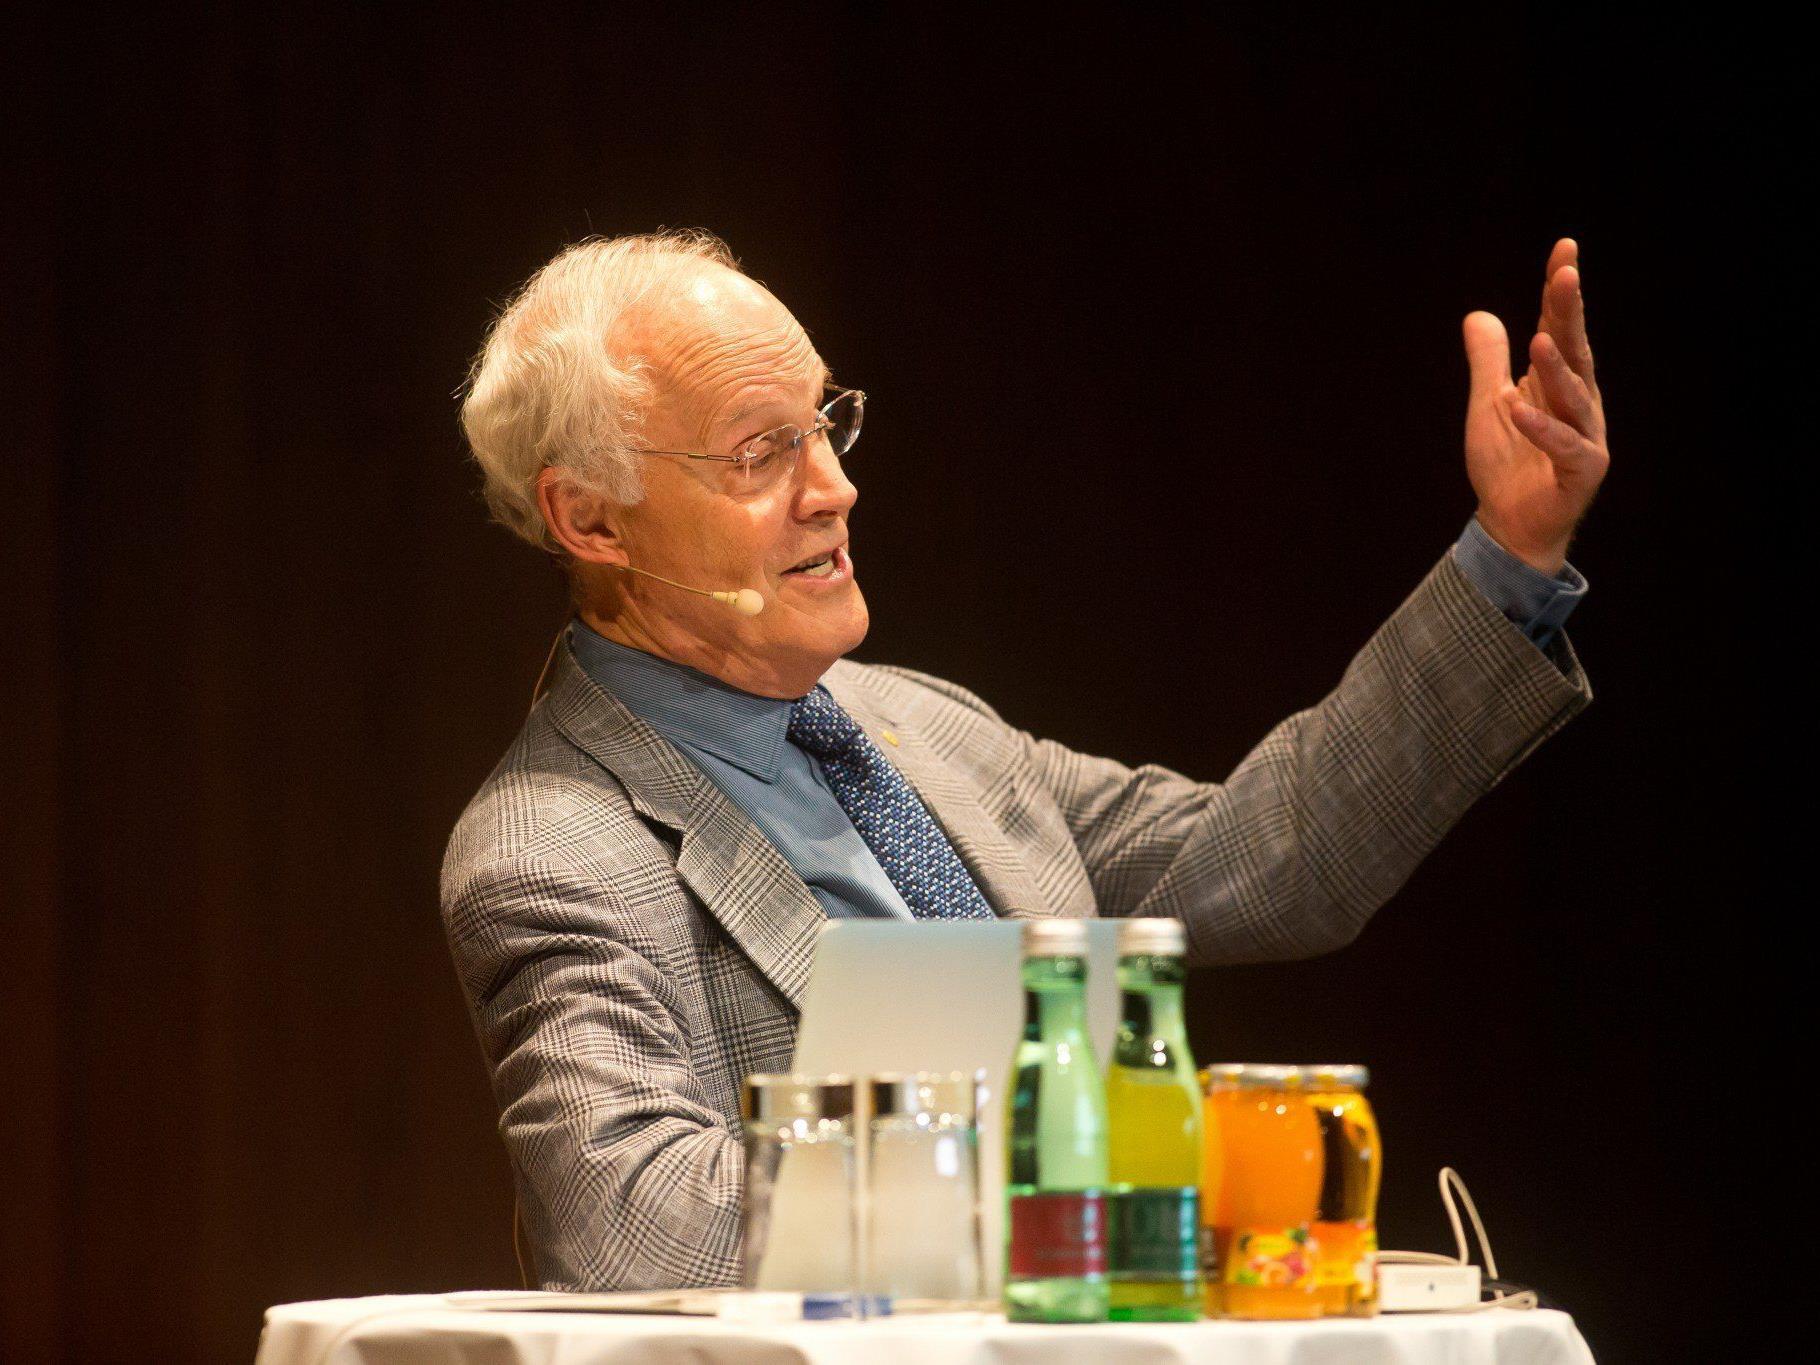 Nobelpreisträger Dr. David Gross hält Vortrag vor sehr viel Prominenz.